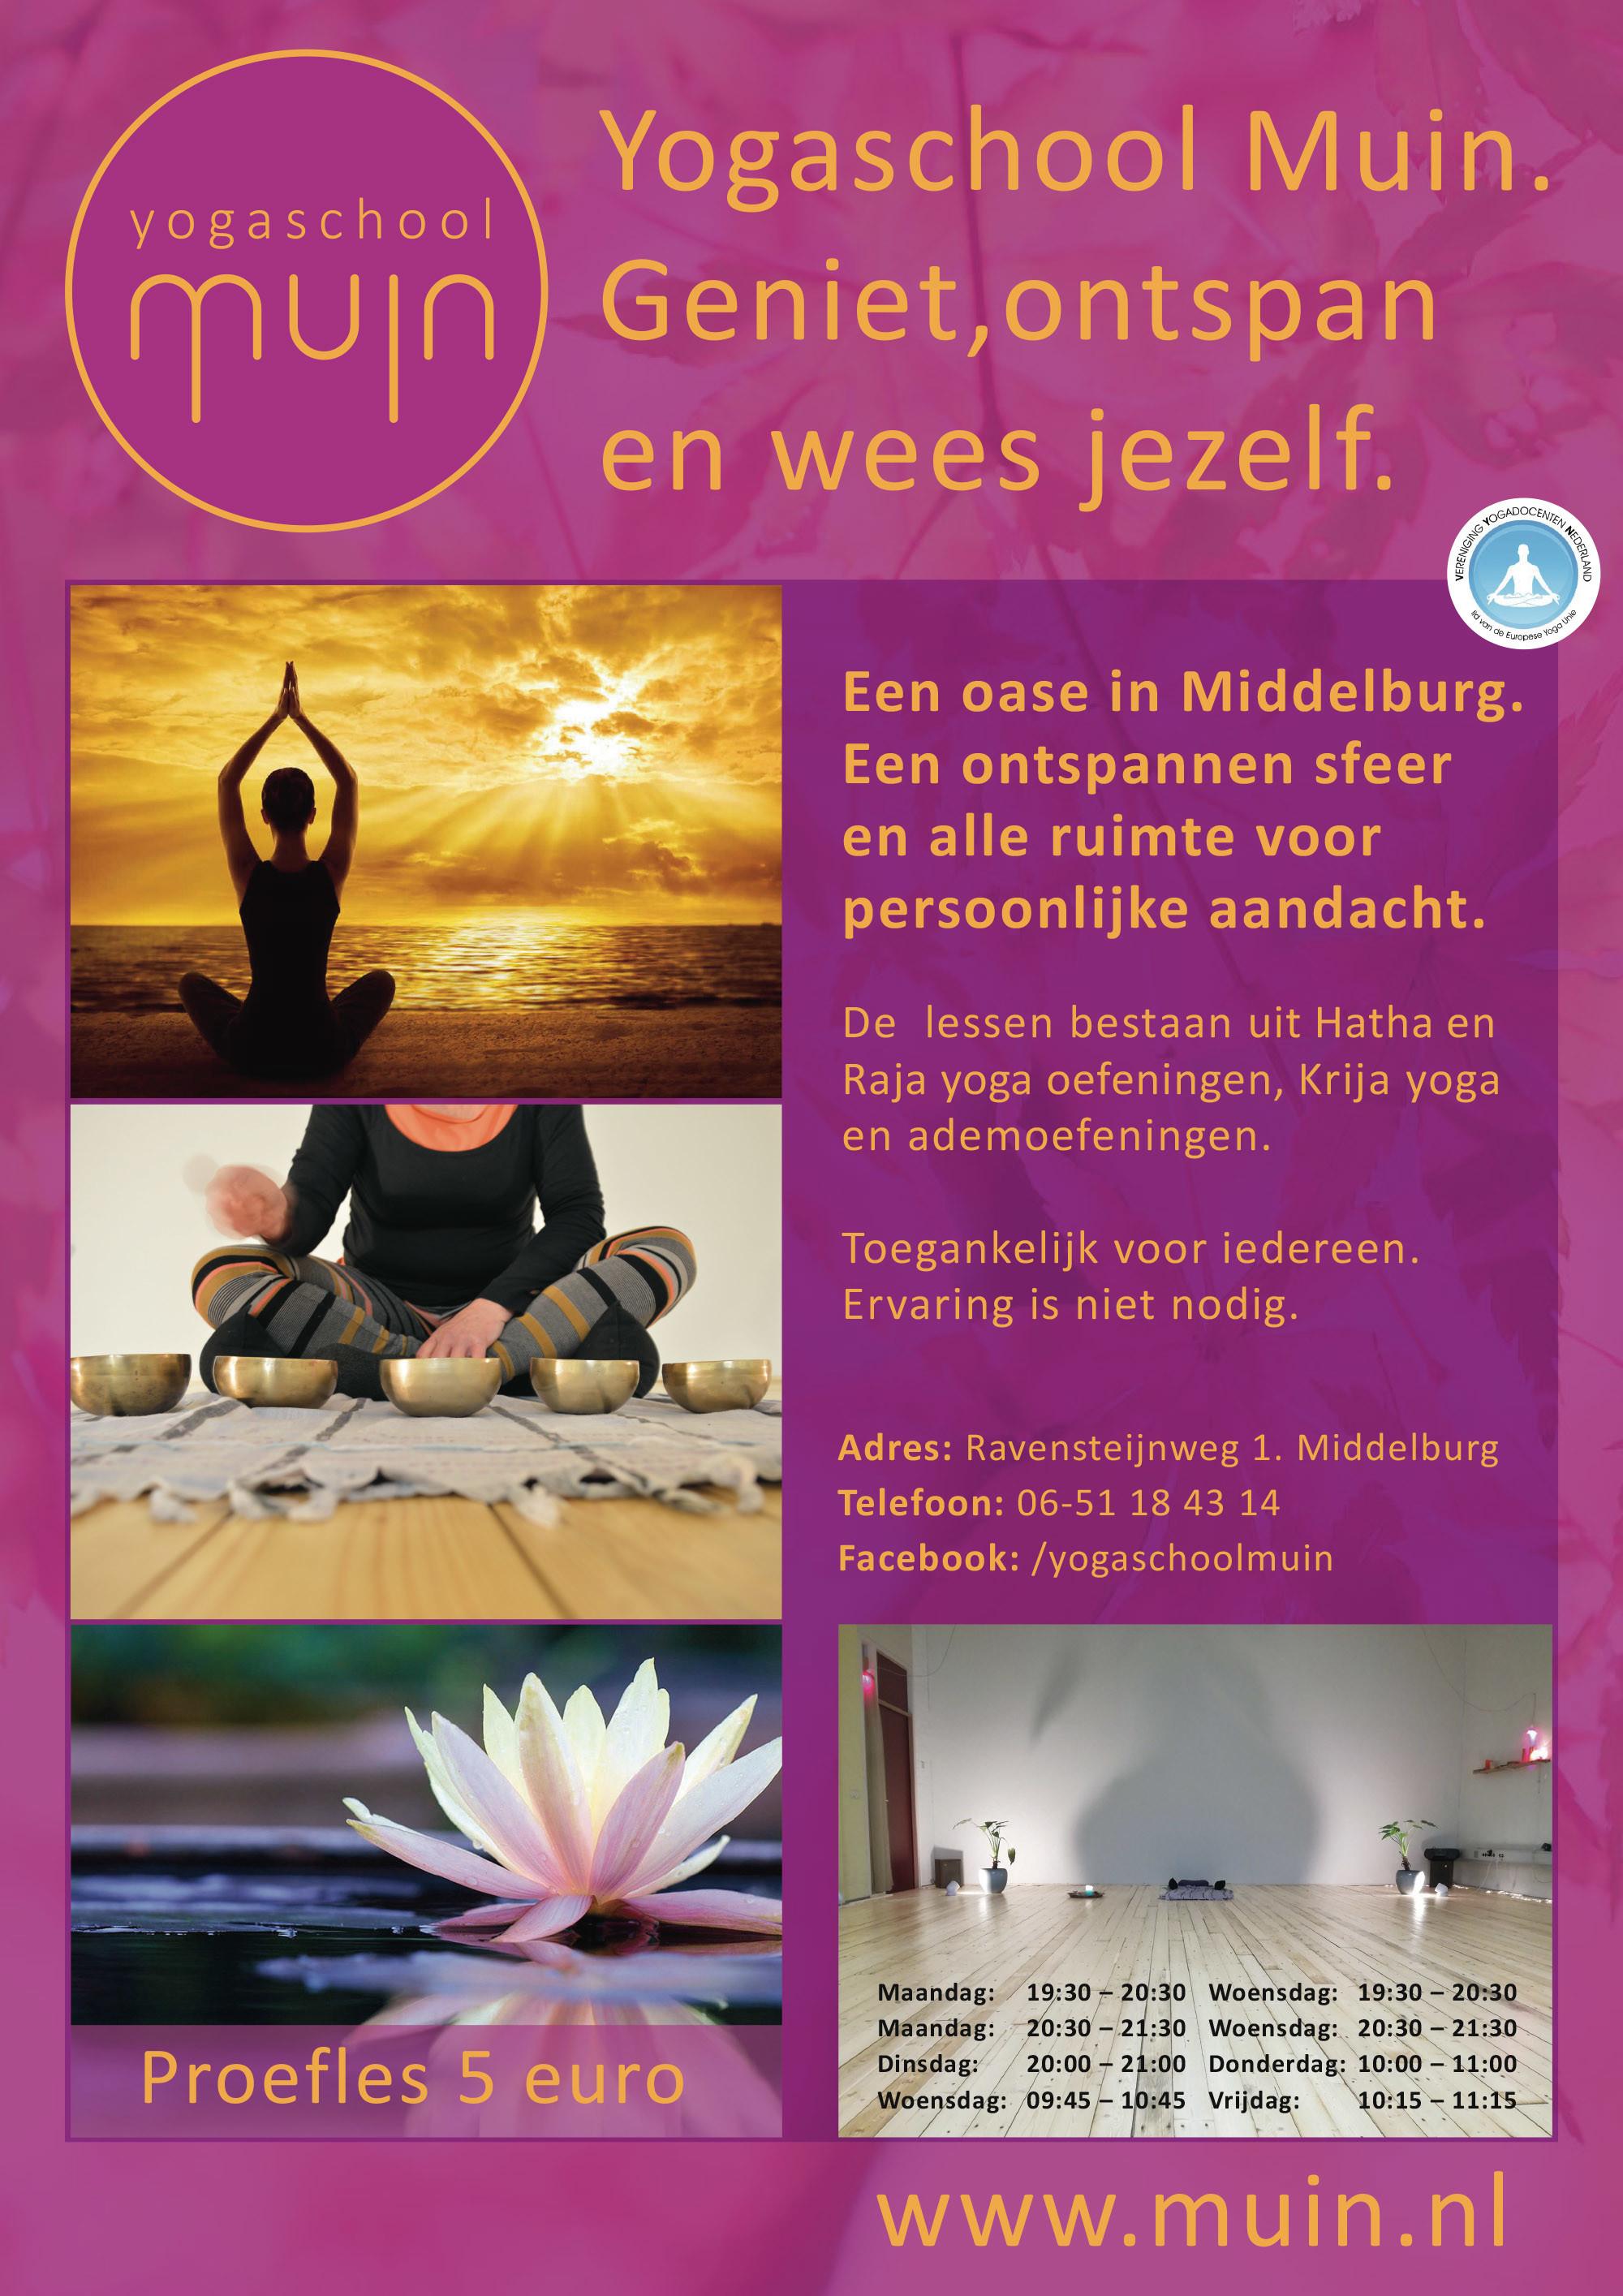 Styling Yogaschool Muin in Middelburg